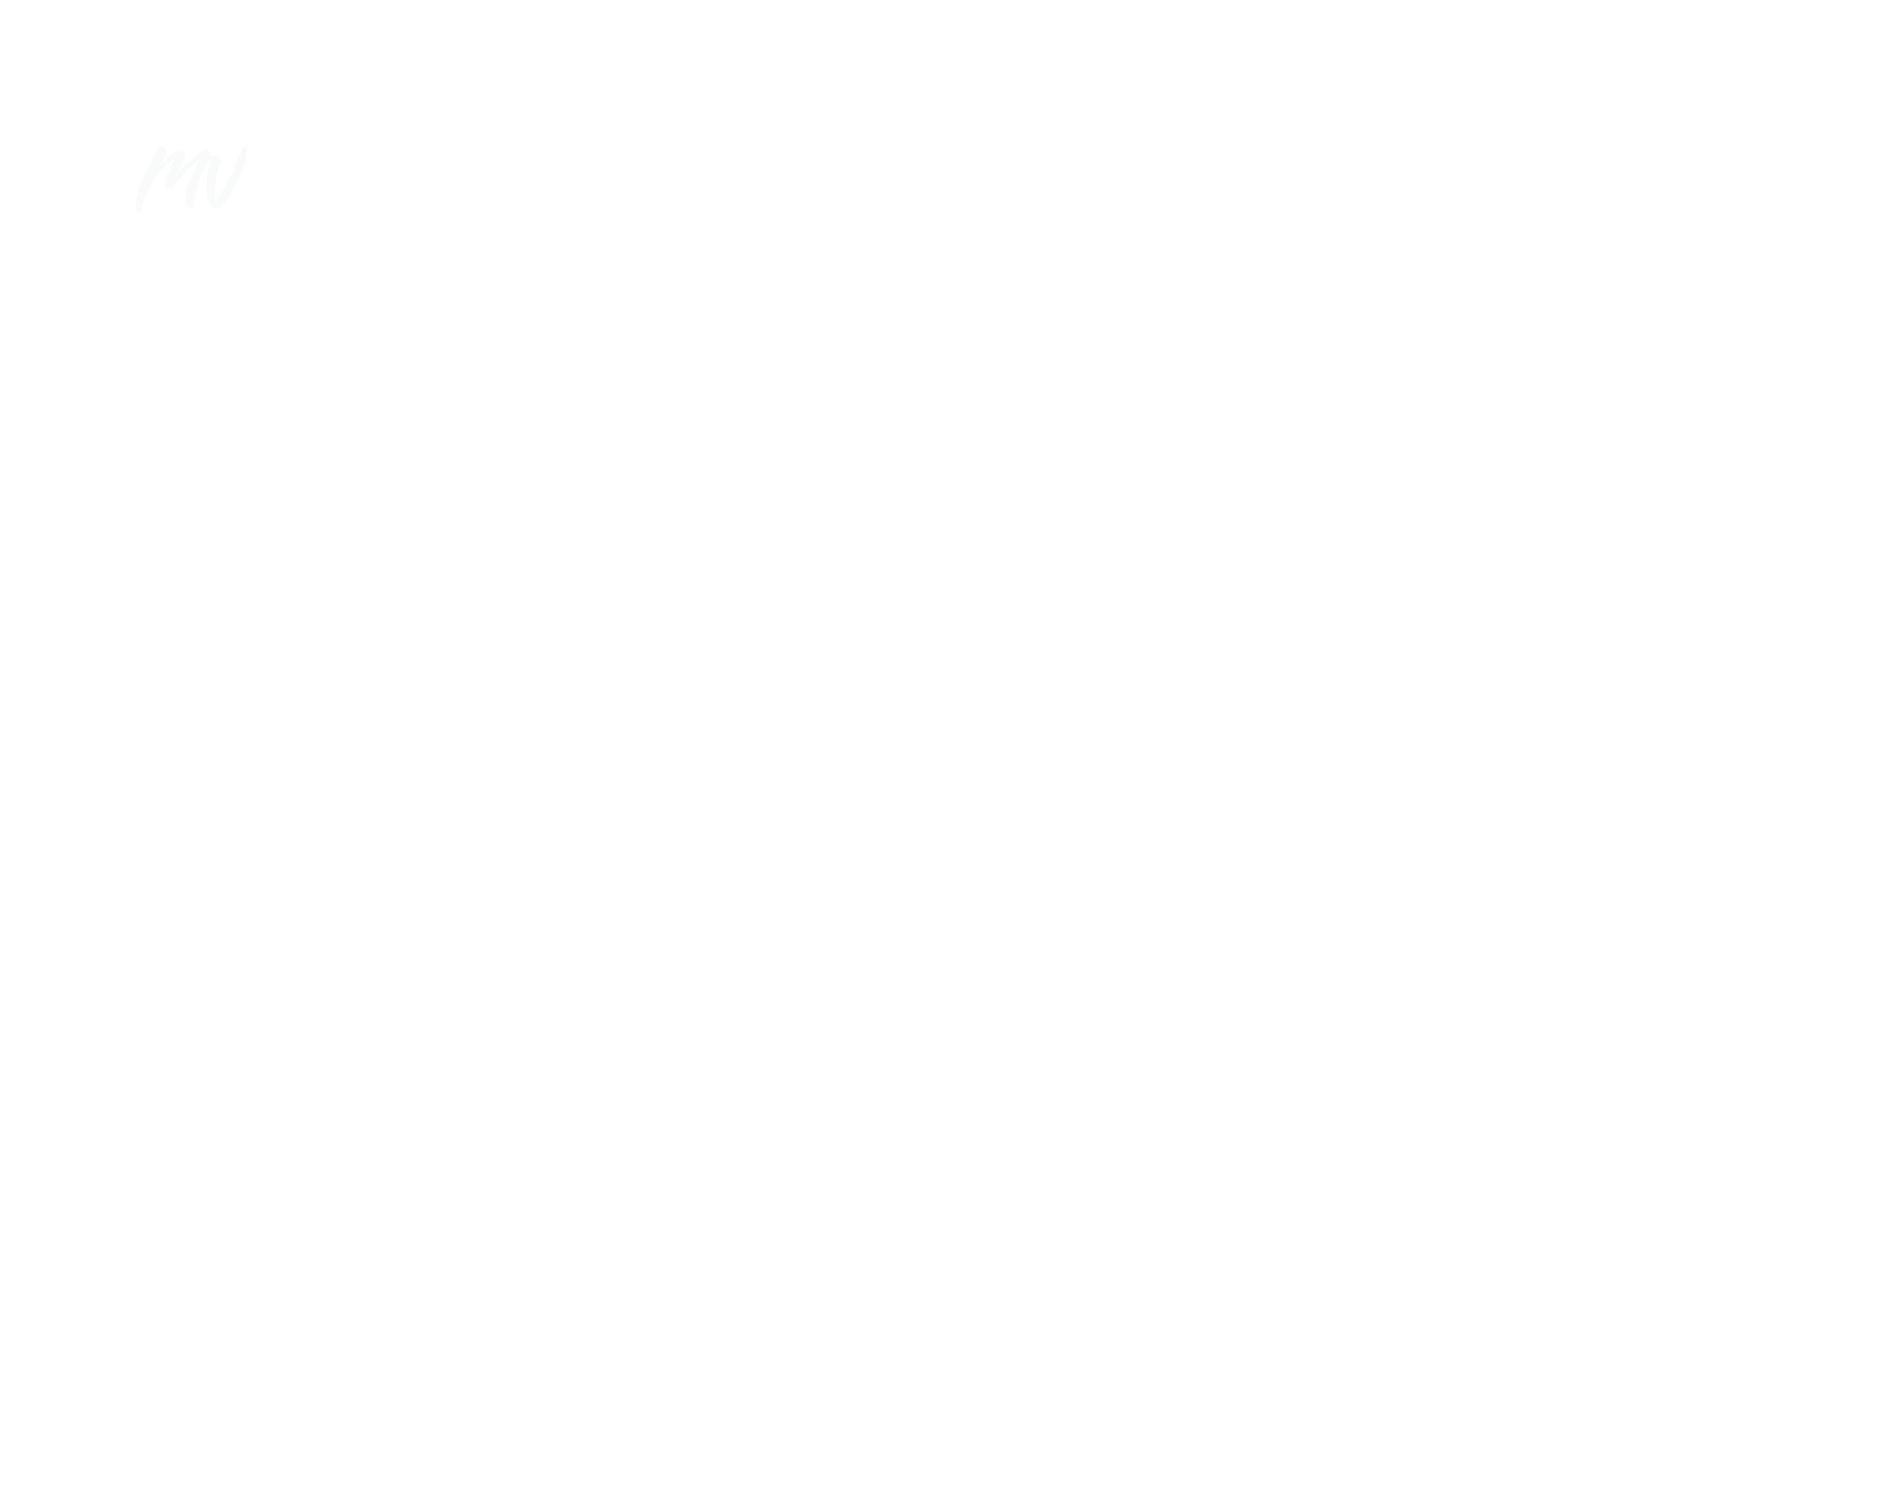 pieni logo mv